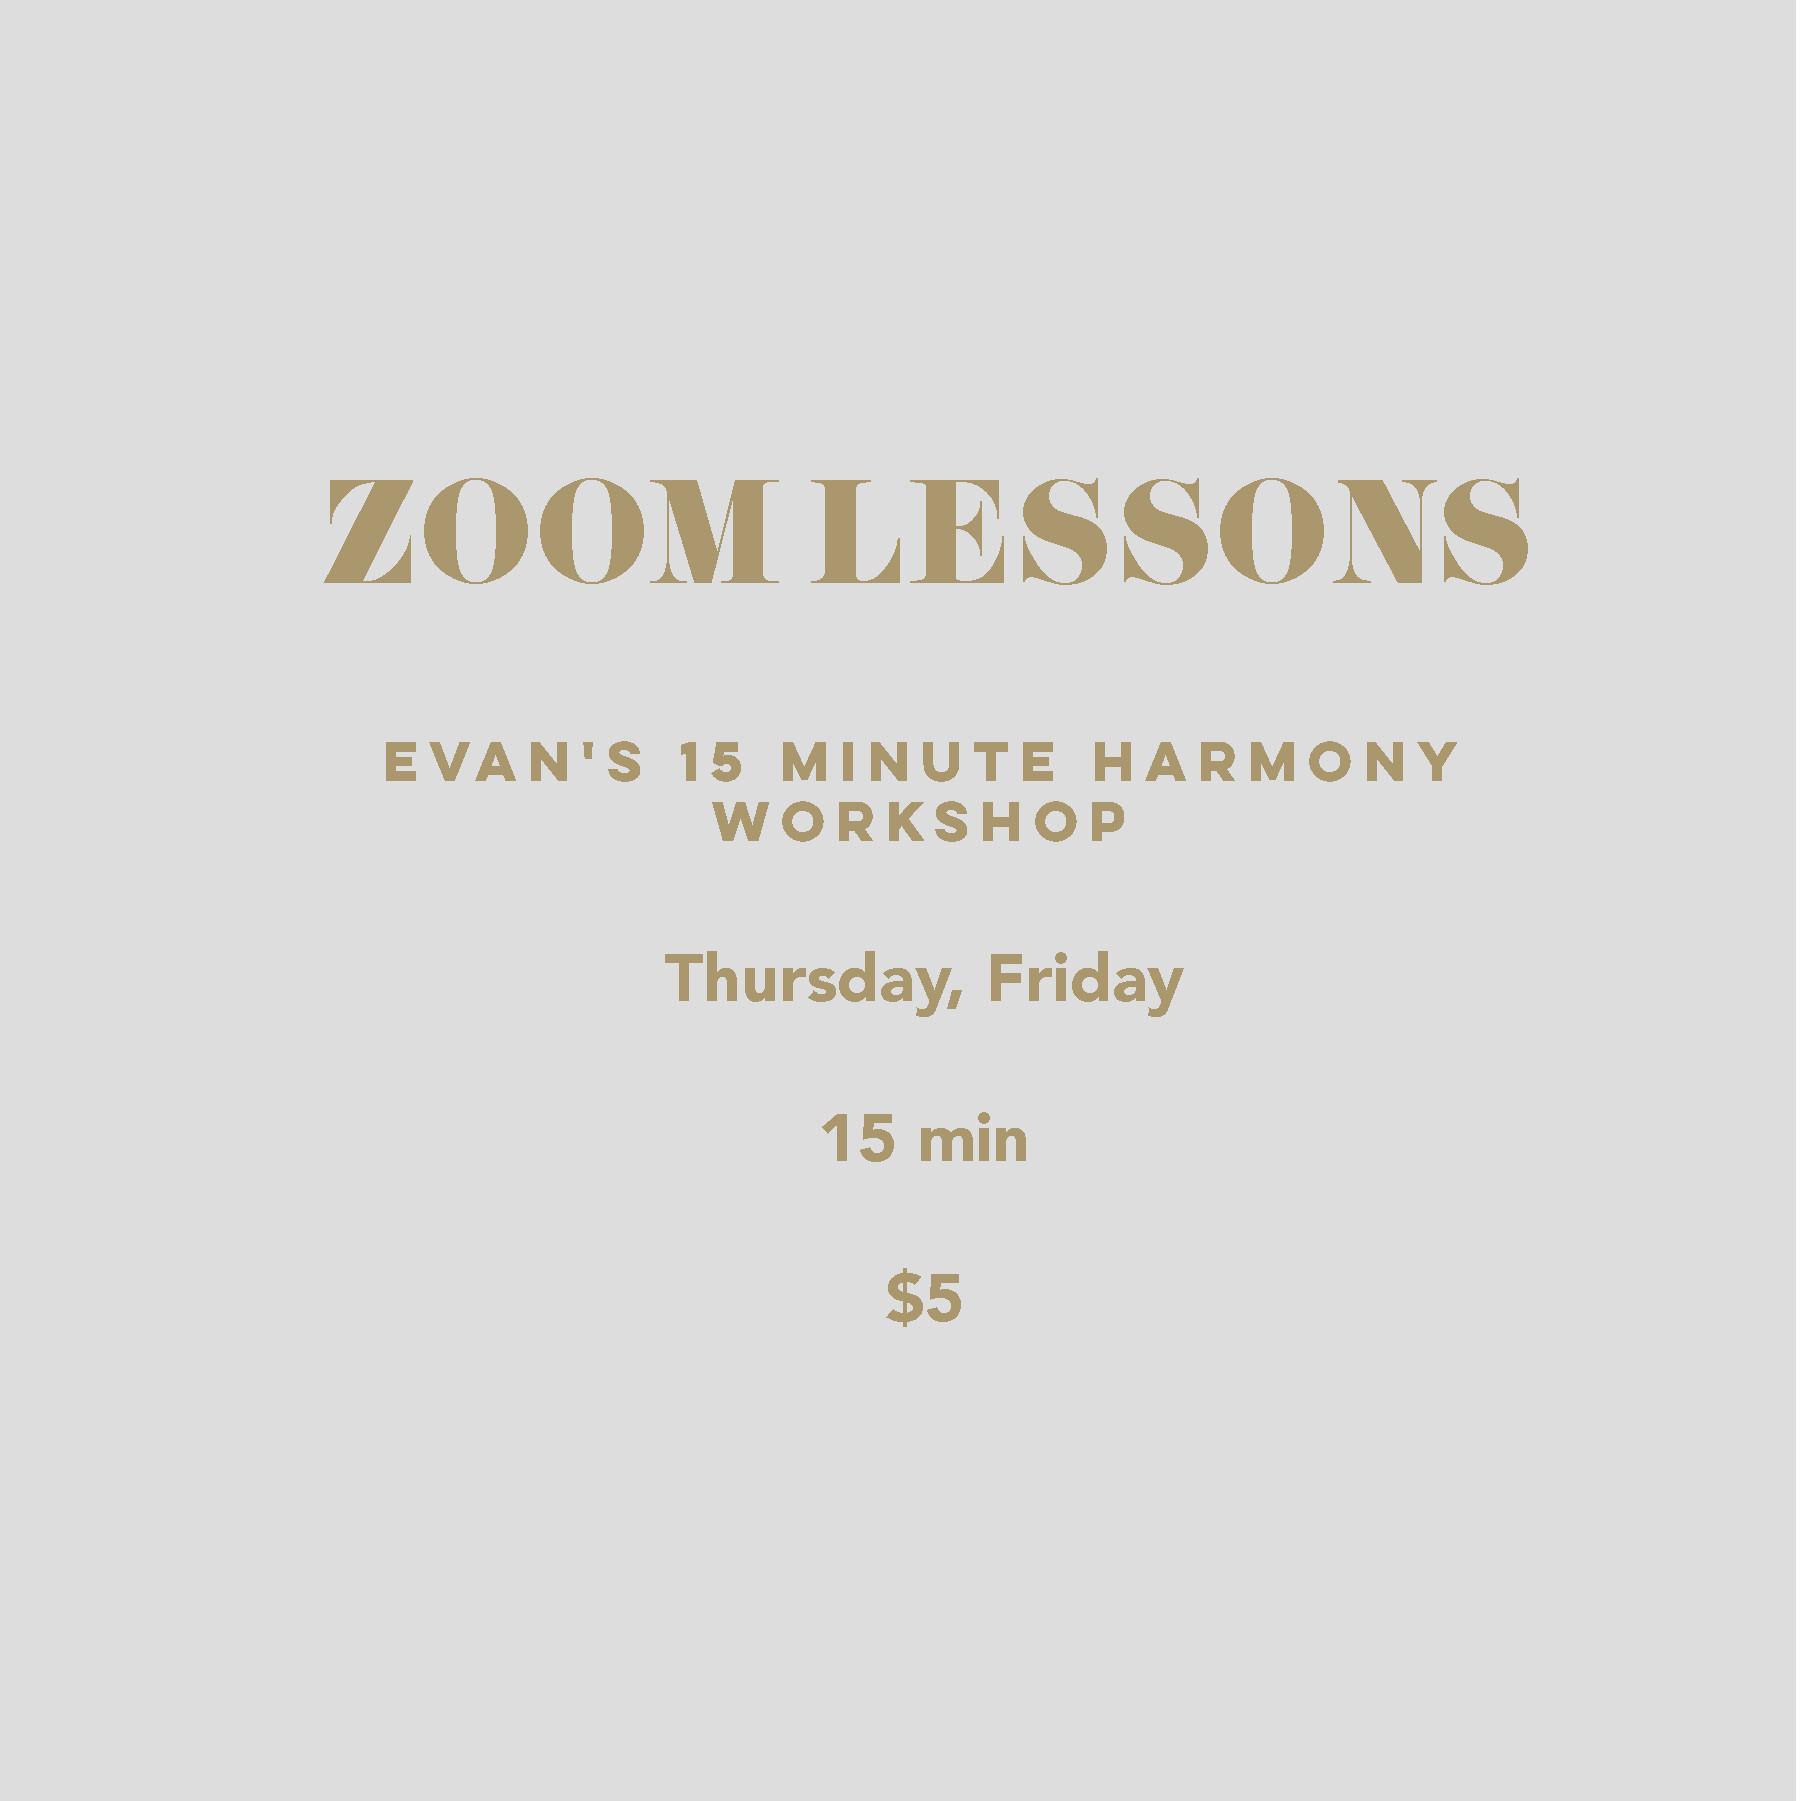 Evan's 15 Minute Harmony Workshop